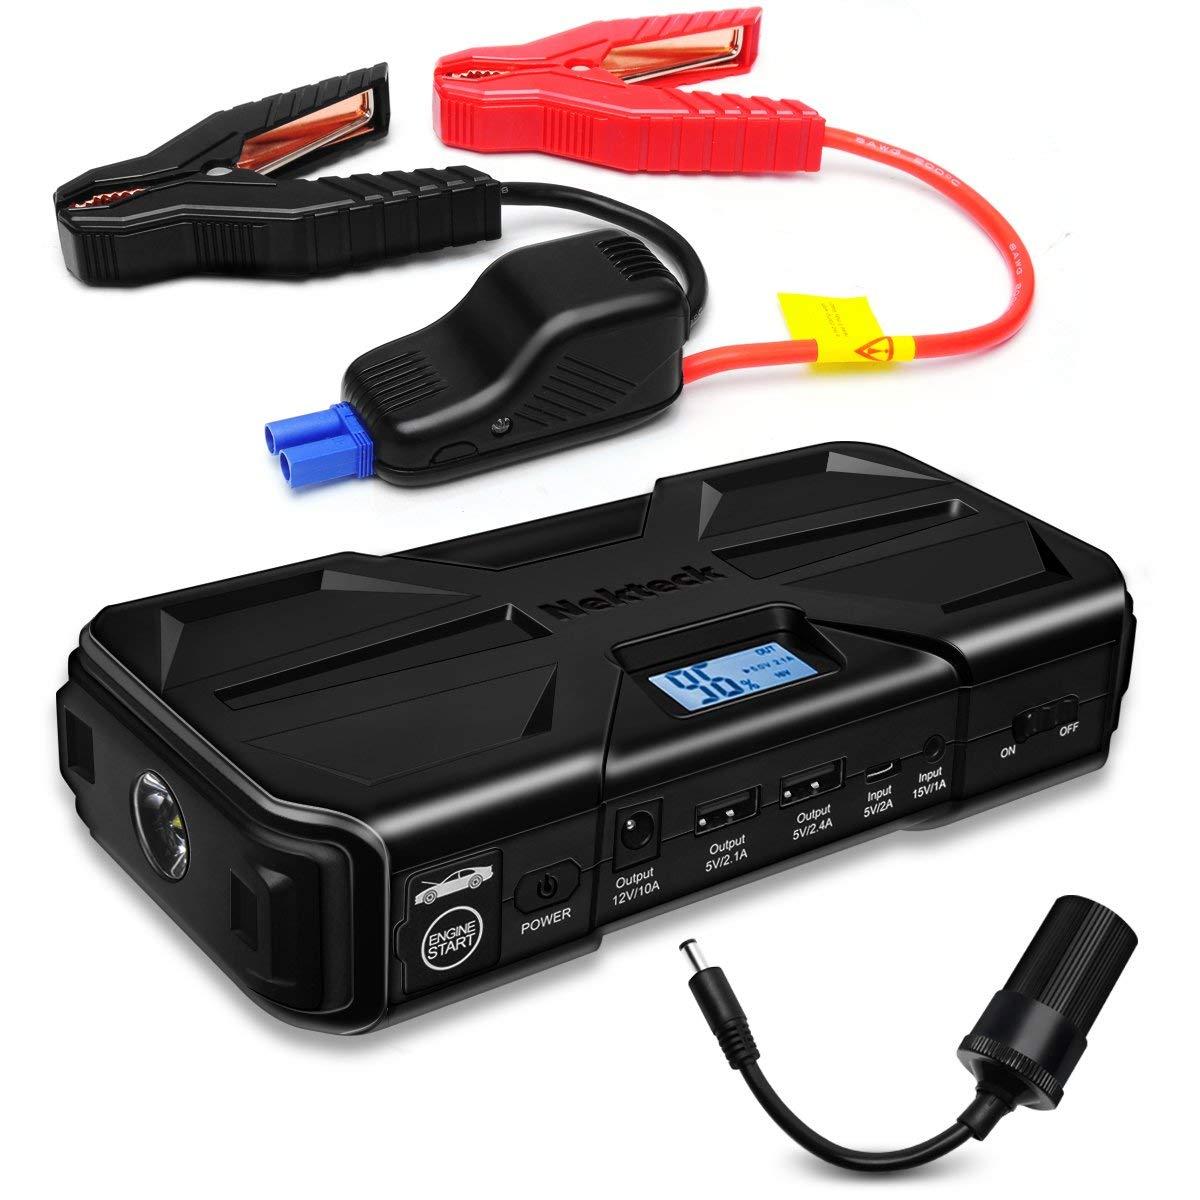 Car Jump Starter 20000mAh Emergency Battery Pack Jump starter